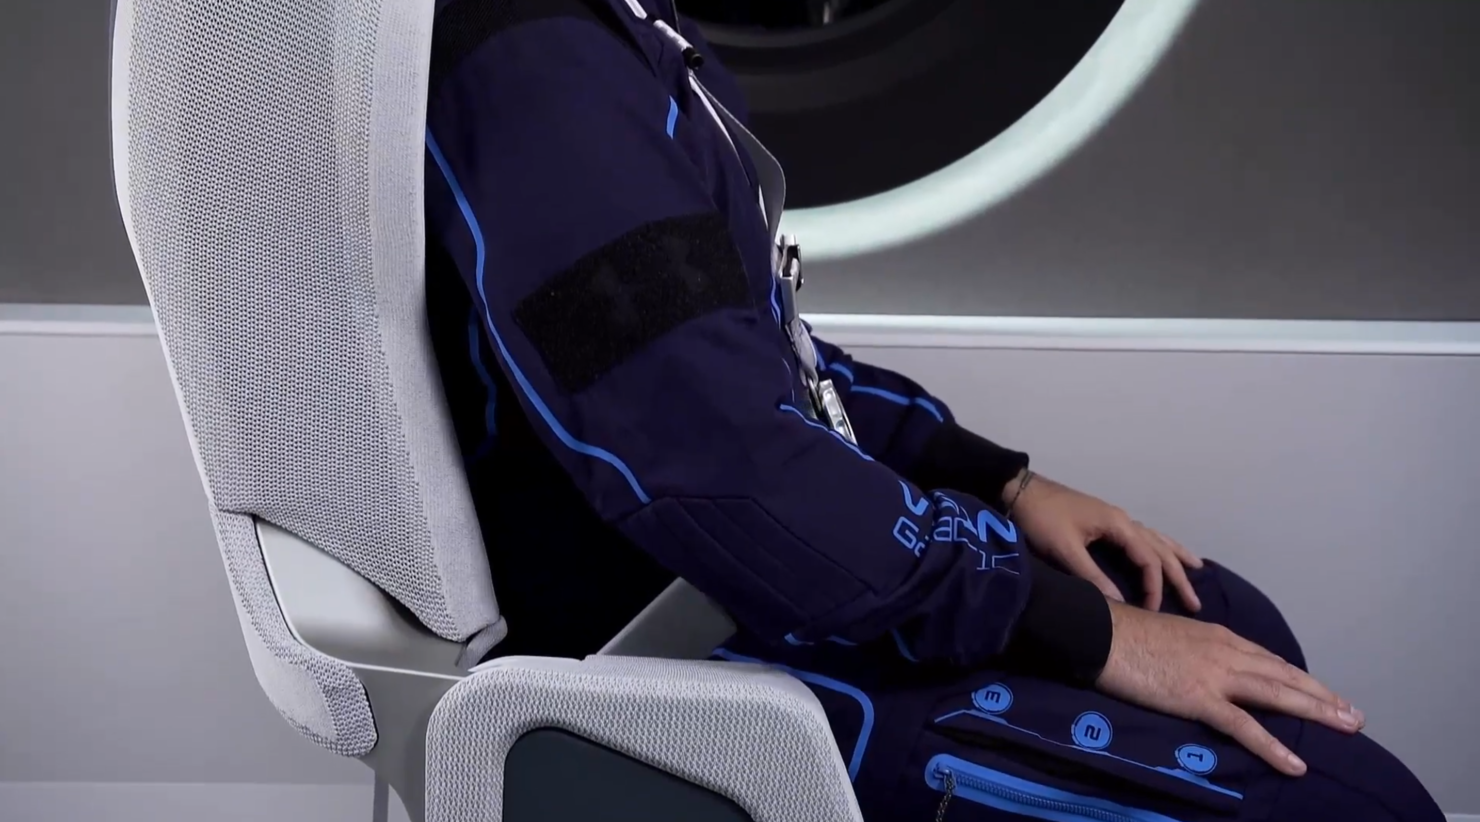 spaceshiptwo-seat